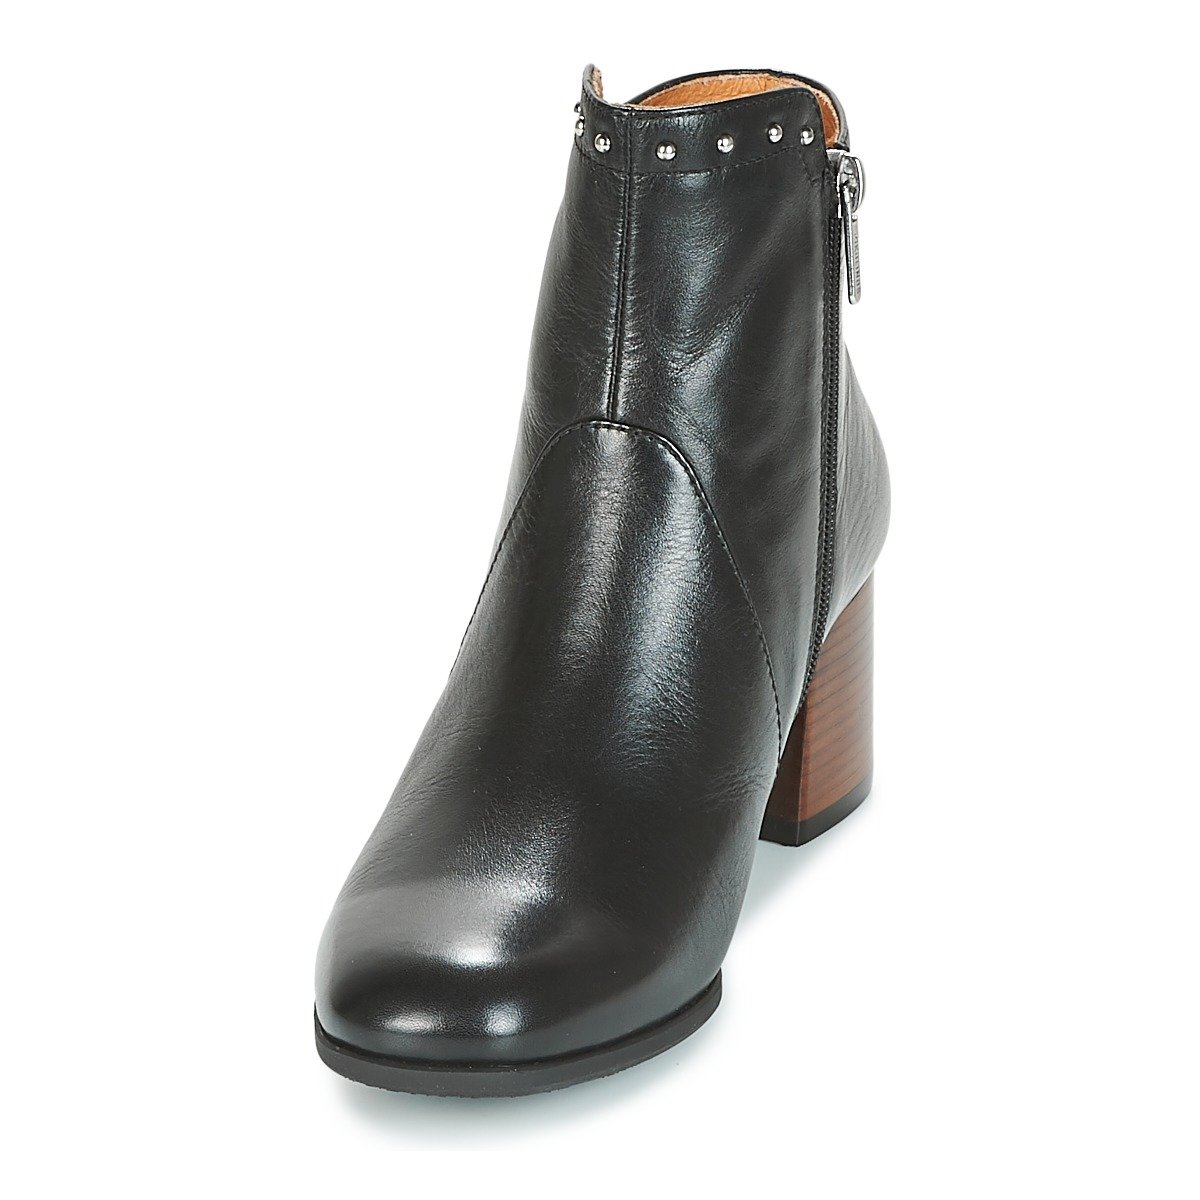 Amazon.com: Pikolinos Bayona - Botas para mujer: Shoes